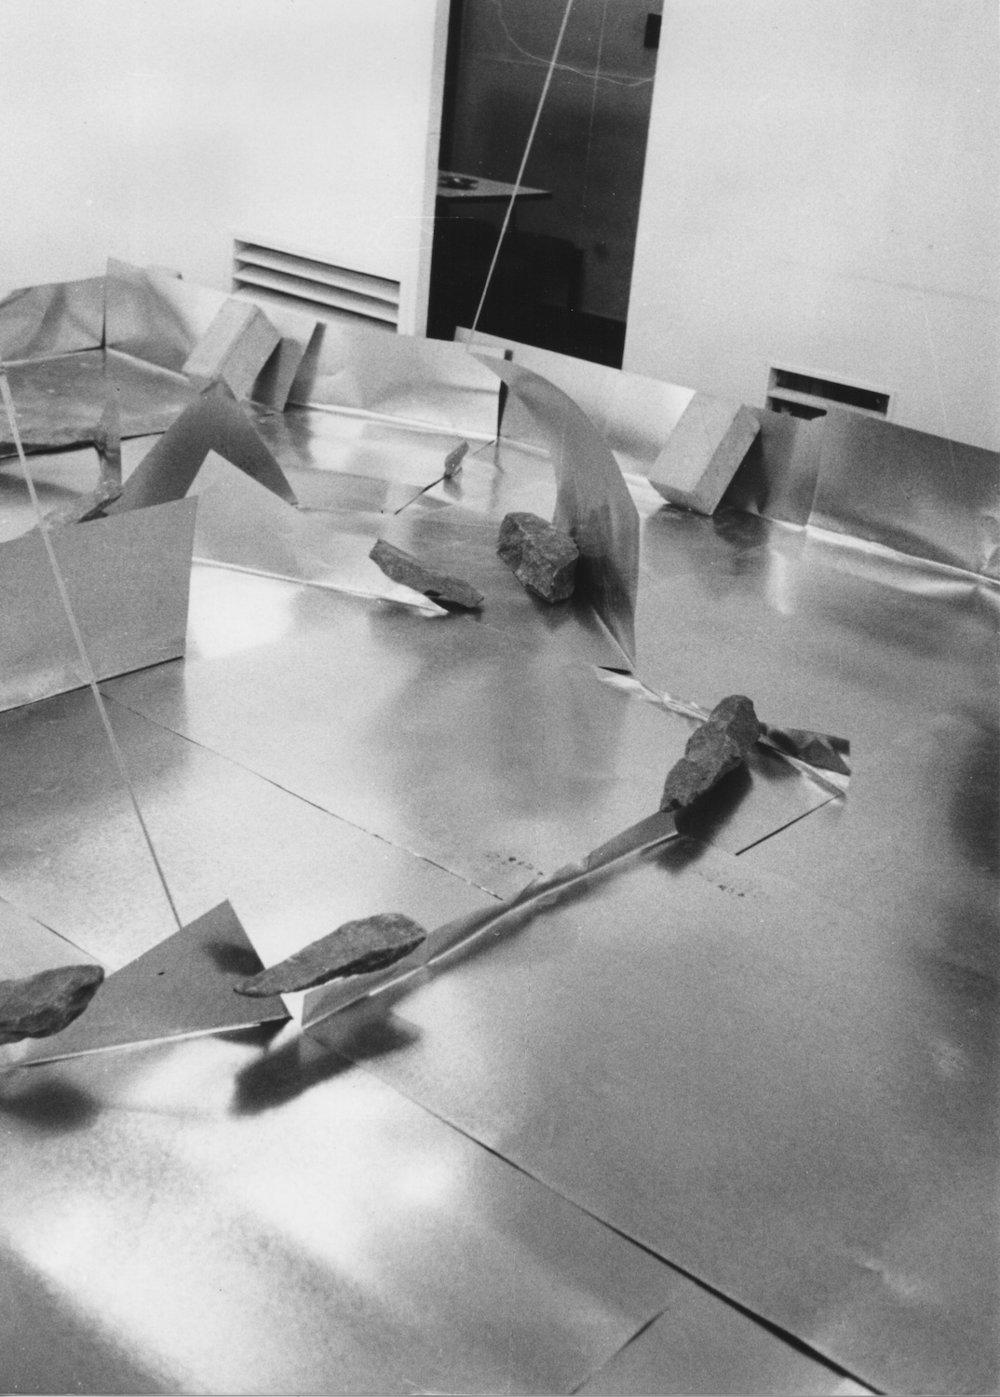 Separating Dependence , 1973 依存差 ( Izonsa ) Zinc plates, steel bars, concrete blocks, stones 620 x 580 x 300 cm Installation view at Satou Gallery, Tokyo, 1973 Photo: Shigeo Anzai